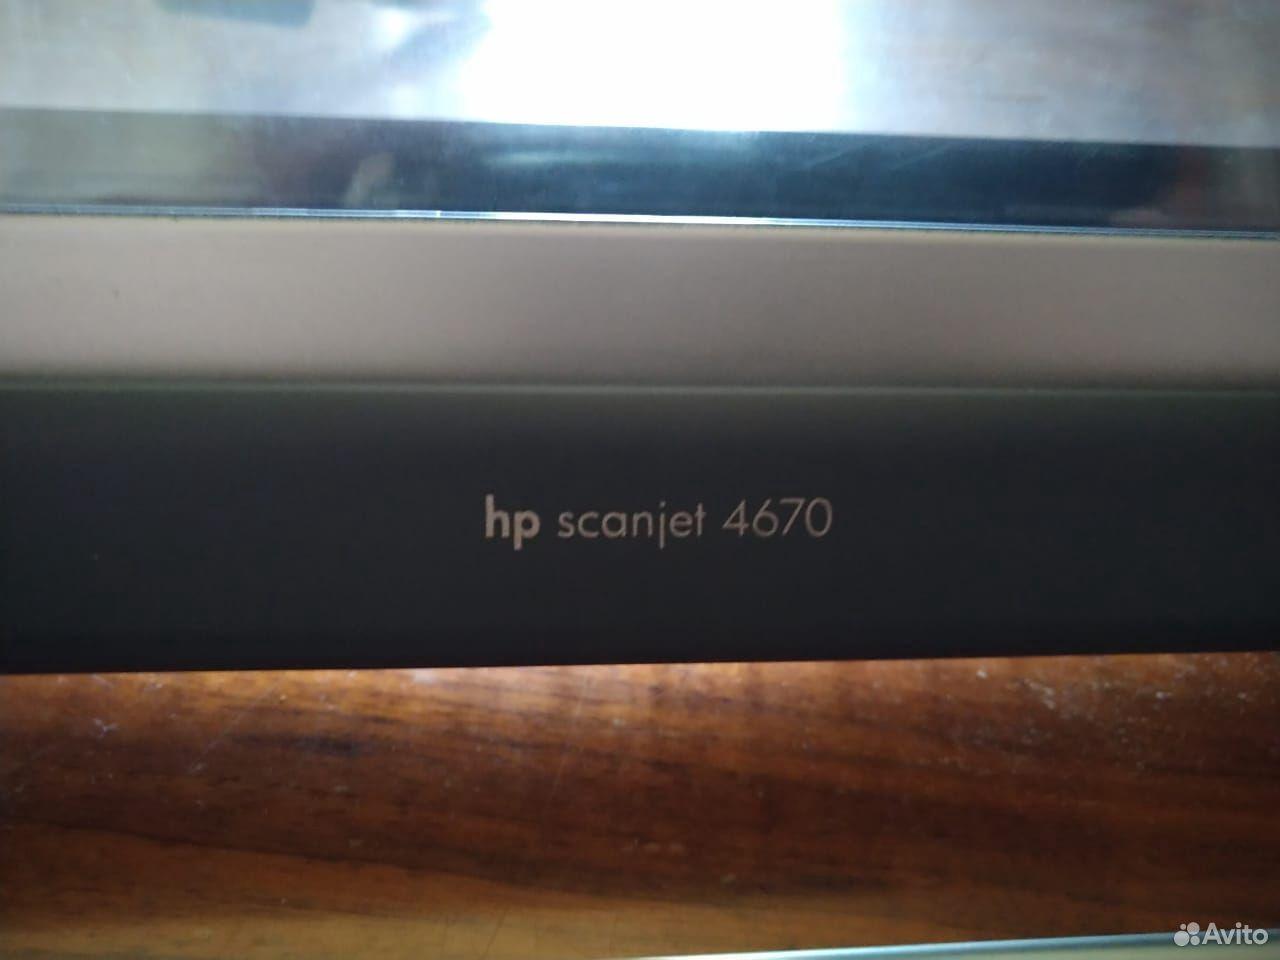 Сканер scanjet hp 4670